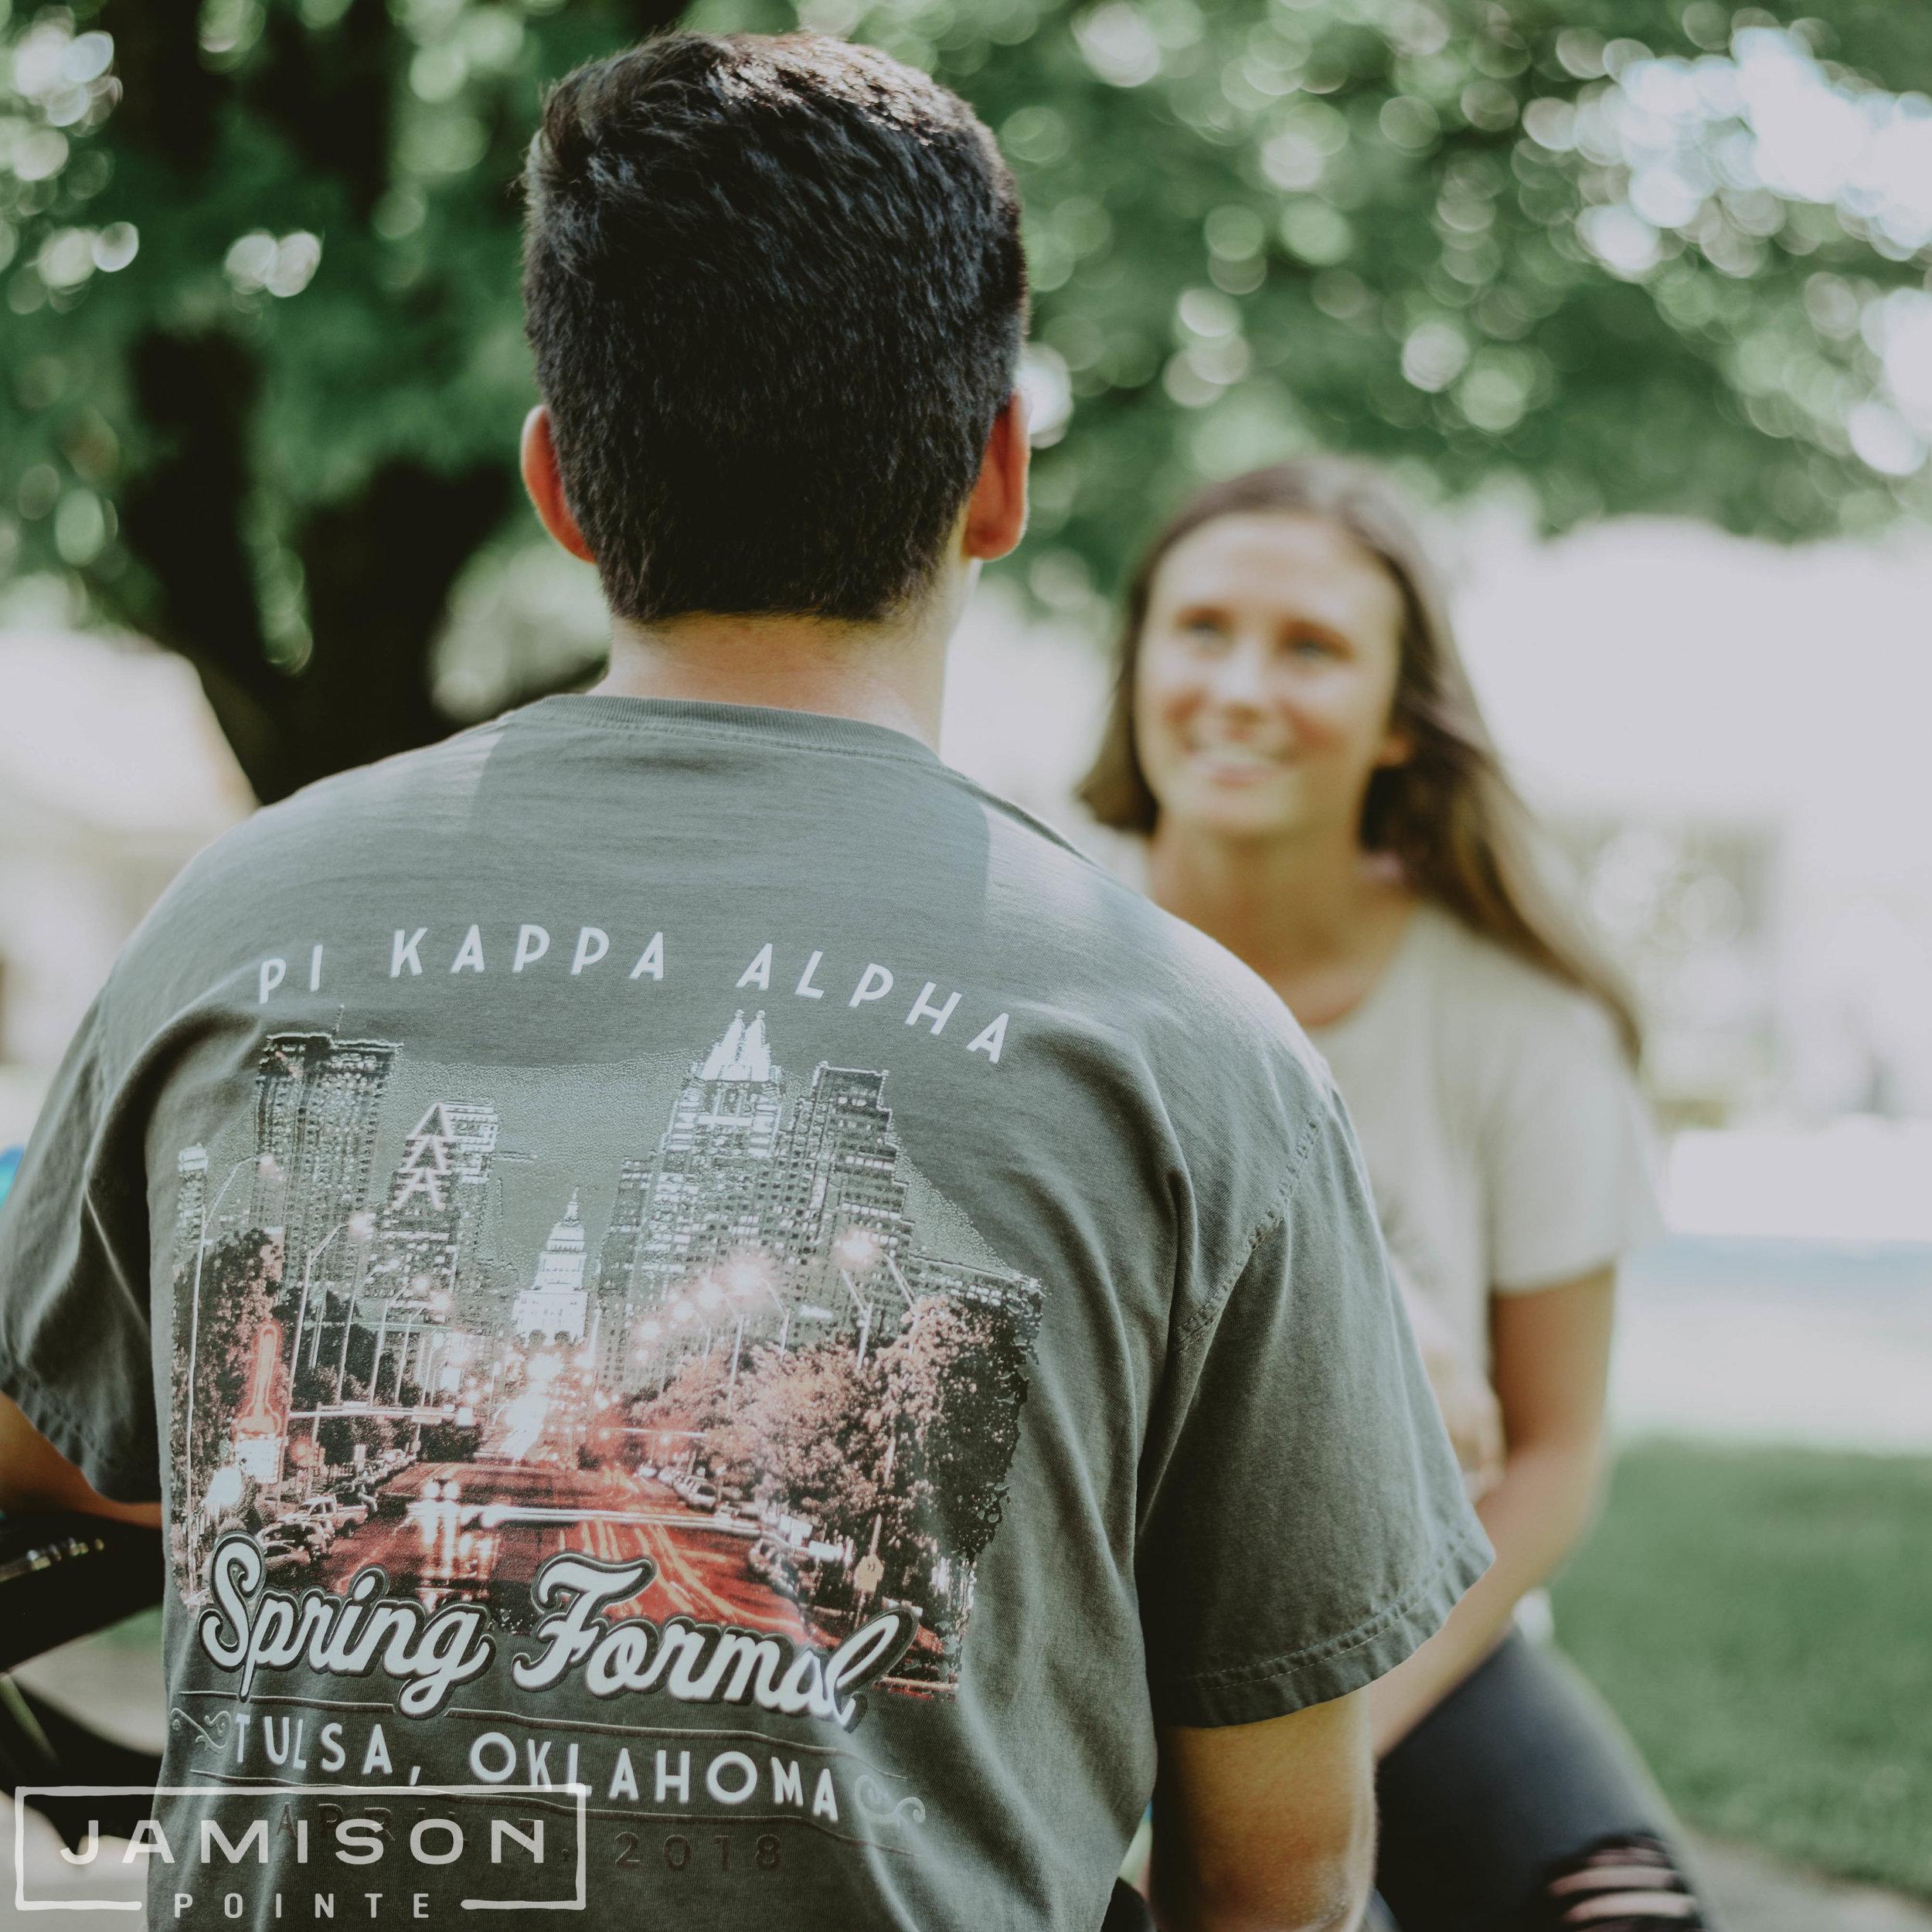 Pi Kappa Alpha Tulsa Spring Formal Tee